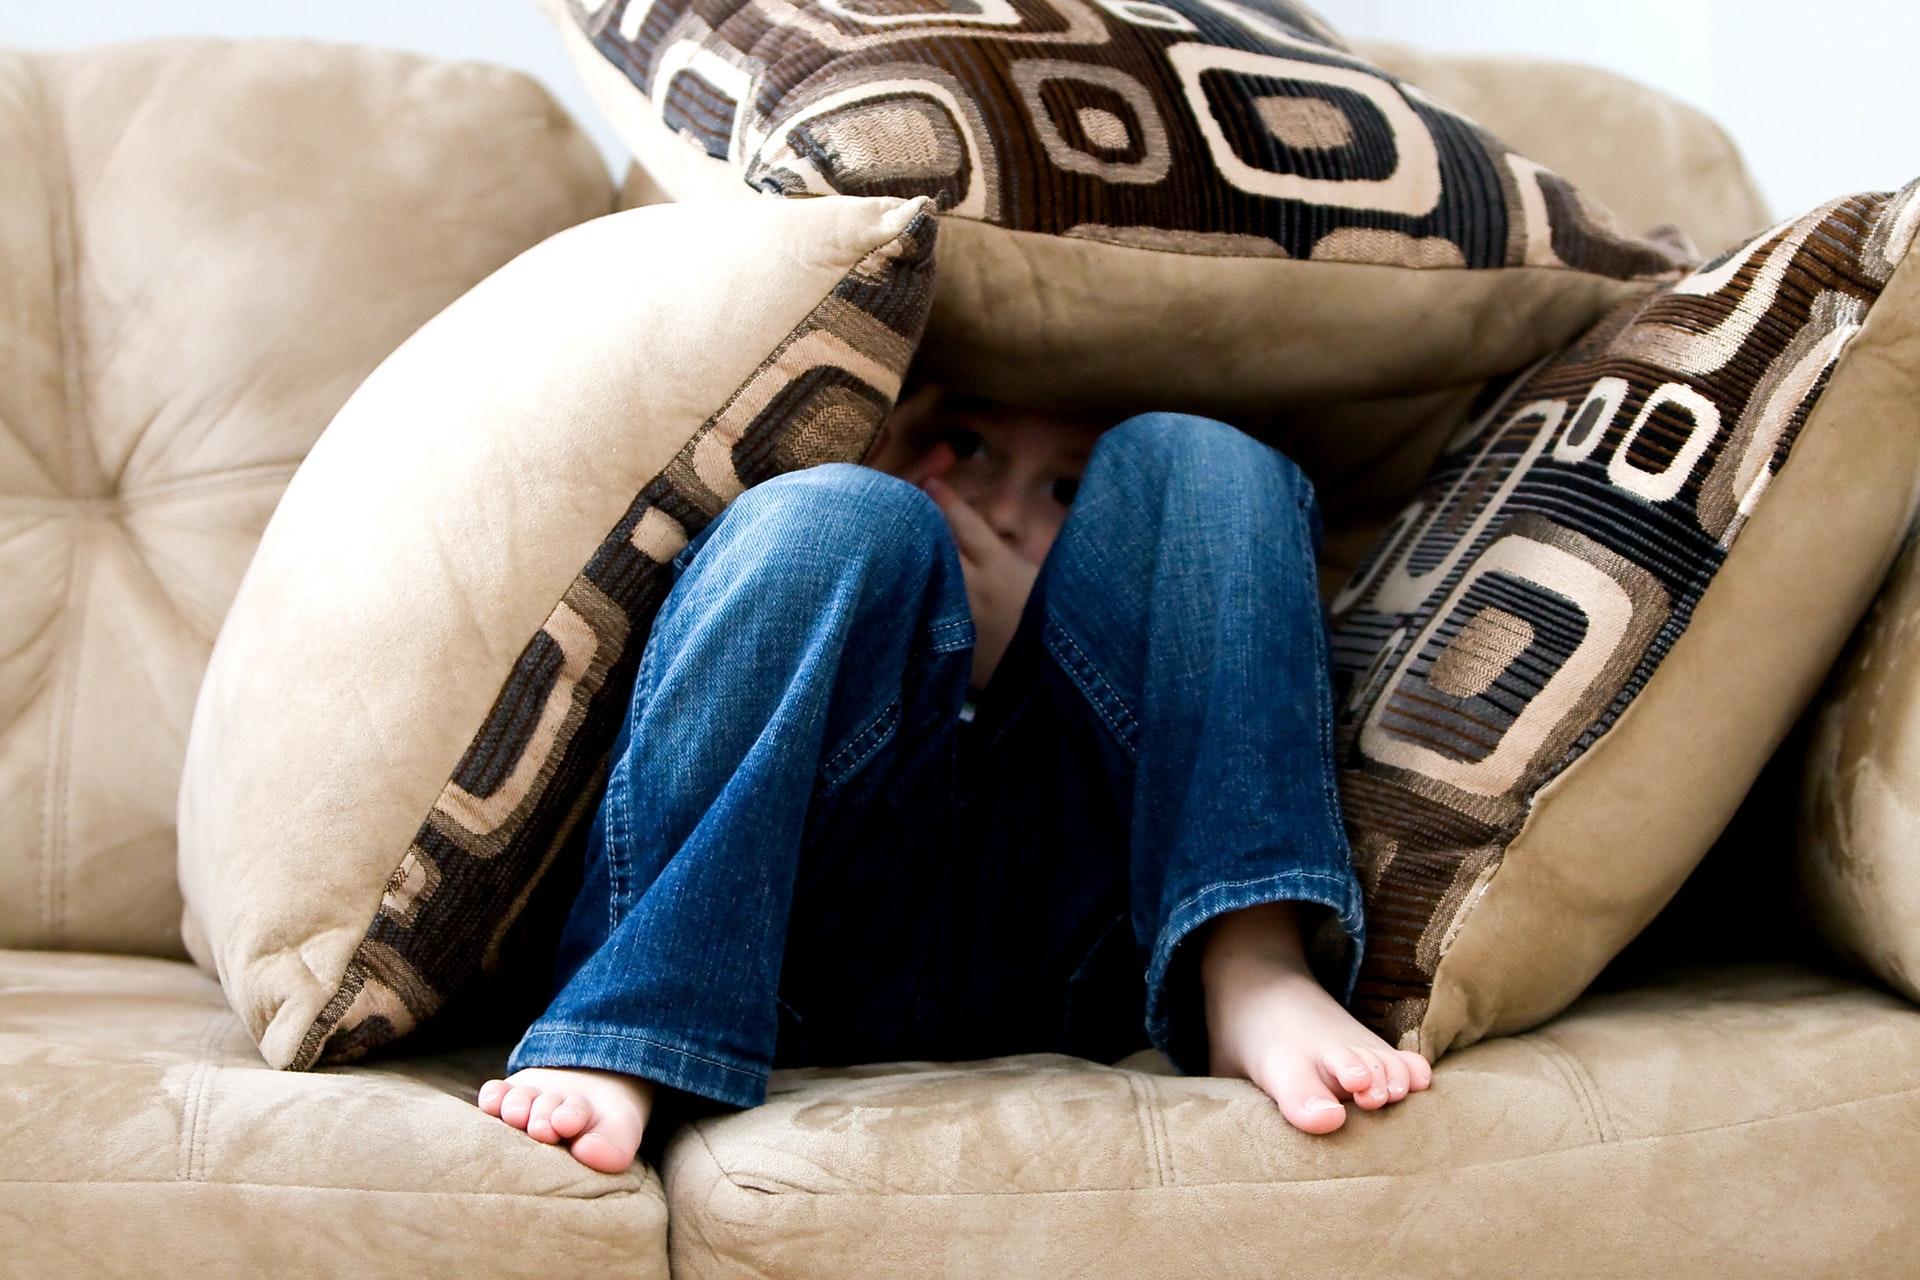 frustrated-child-needs-mindfulness